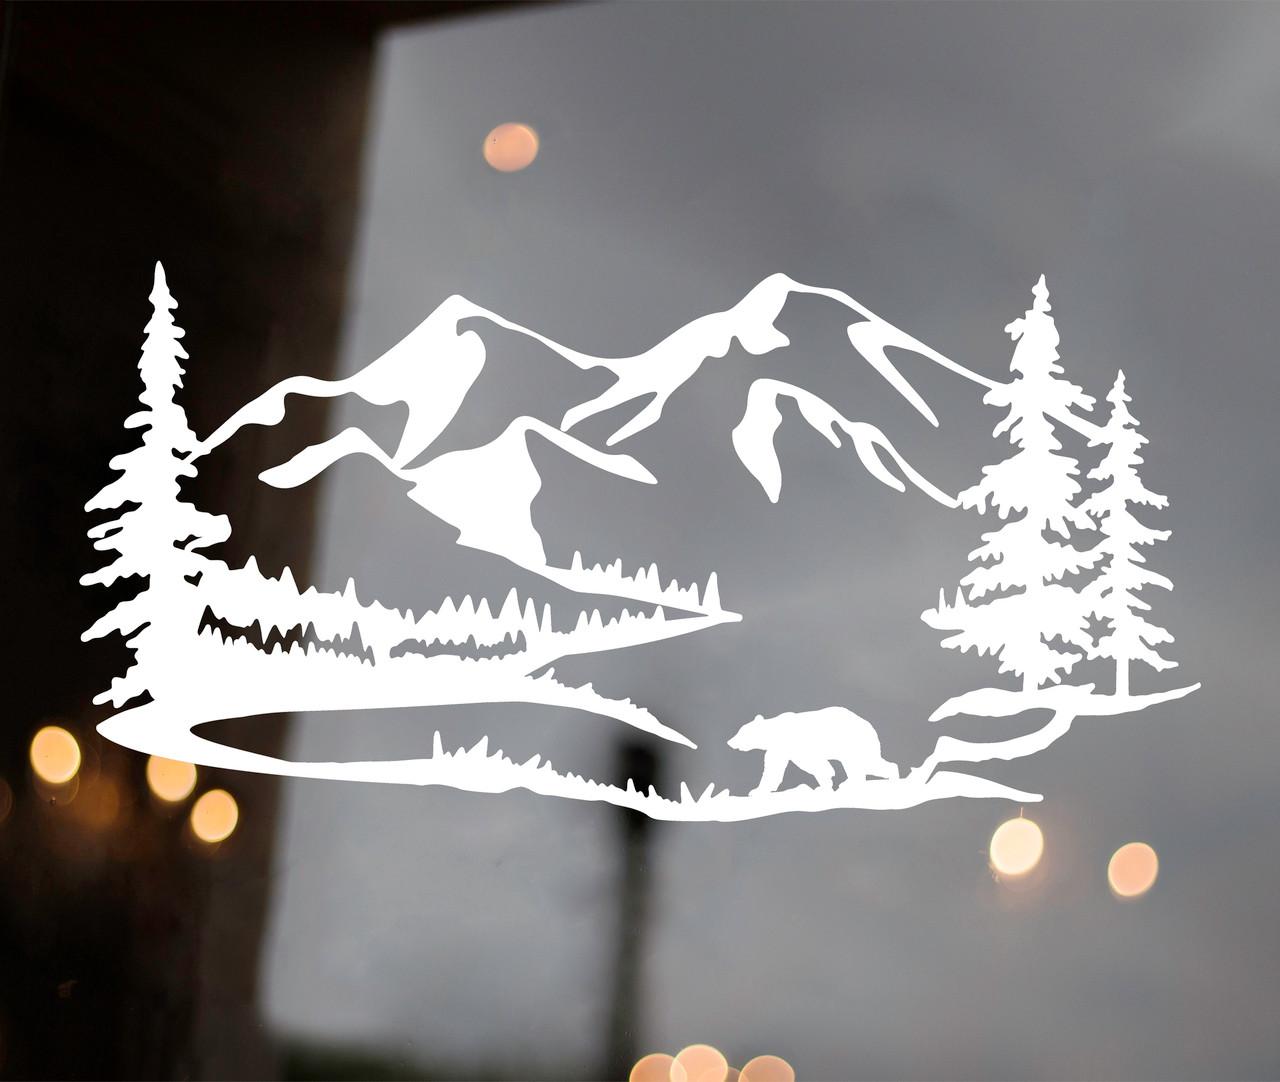 Bear Mountain Trees Scene Vinyl Decal V3 - Camper RV Graphics - Die Cut Sticker